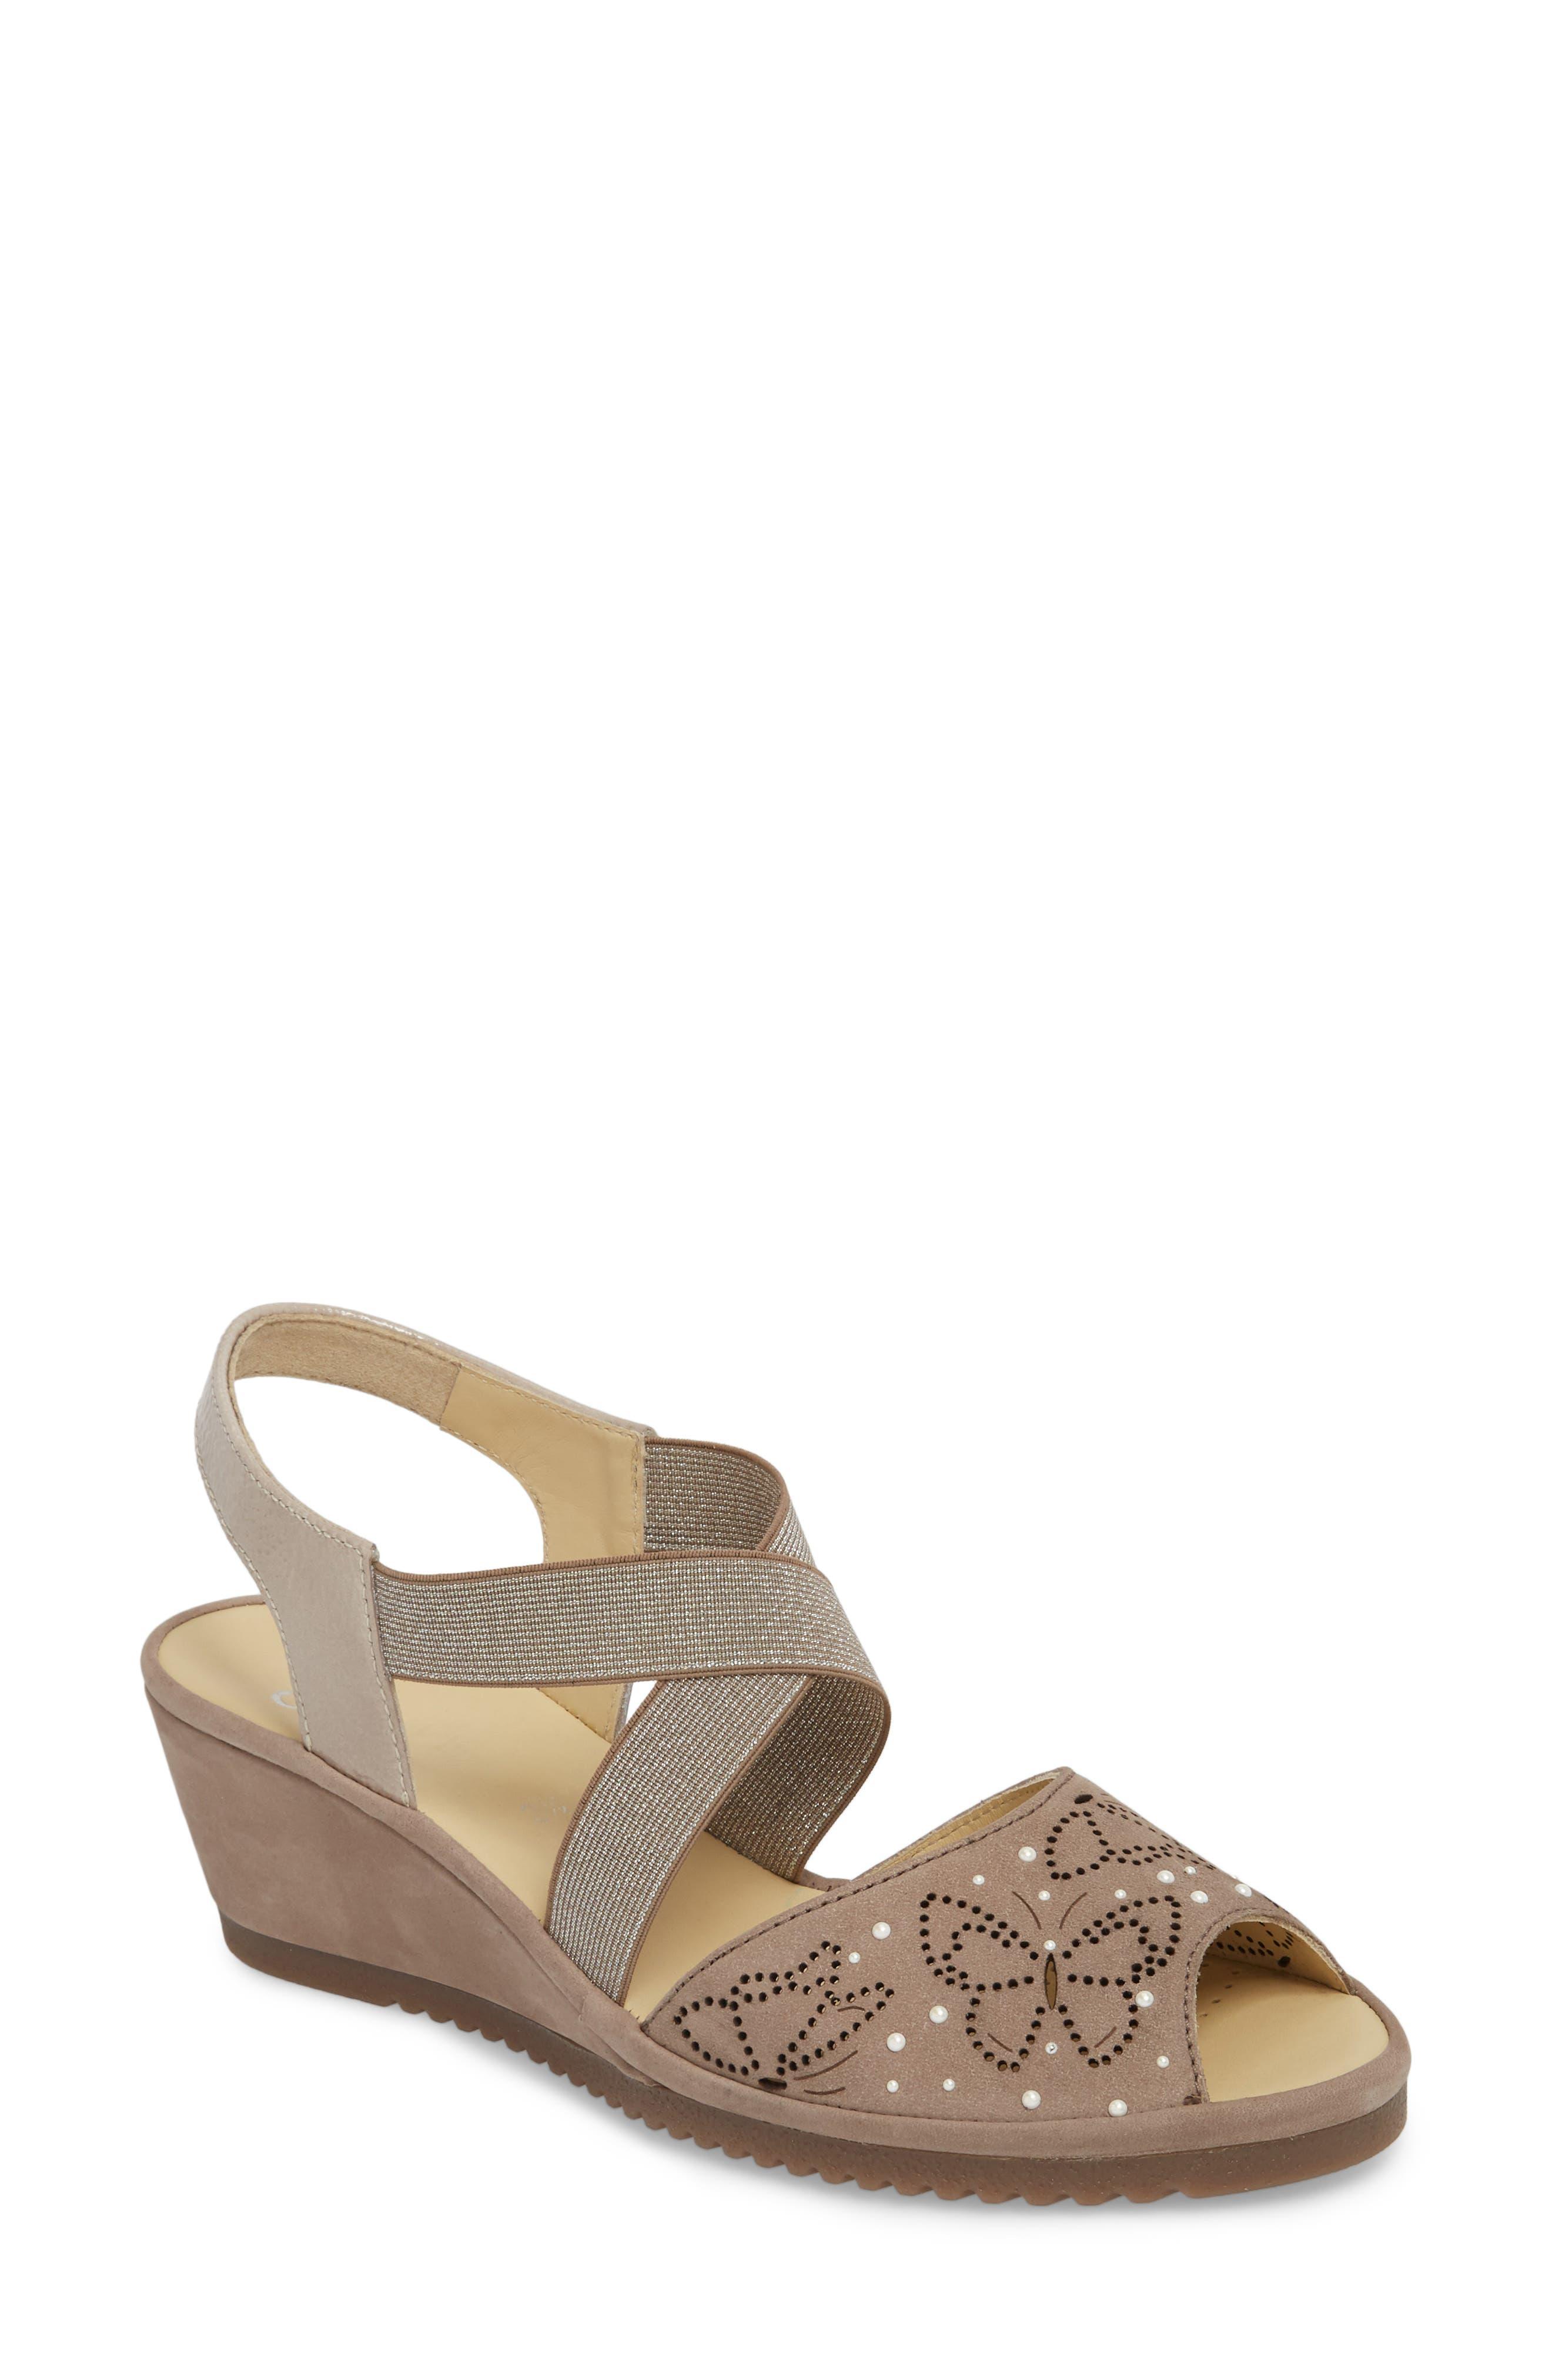 Celia Wedge Sandal,                         Main,                         color, Taupe Nubuck